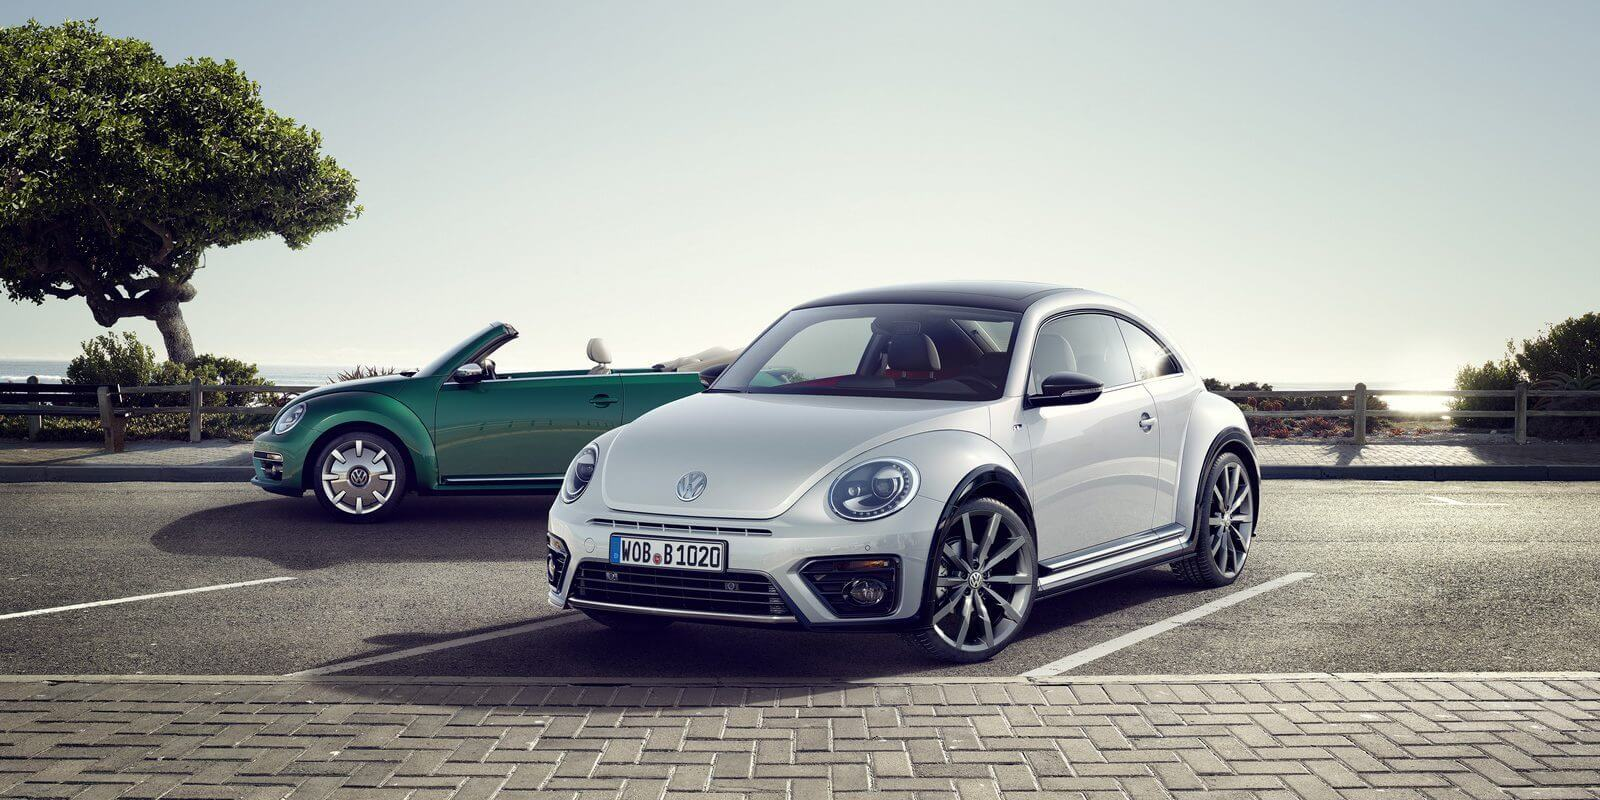 Бензинова версія Volkswagen Beetle